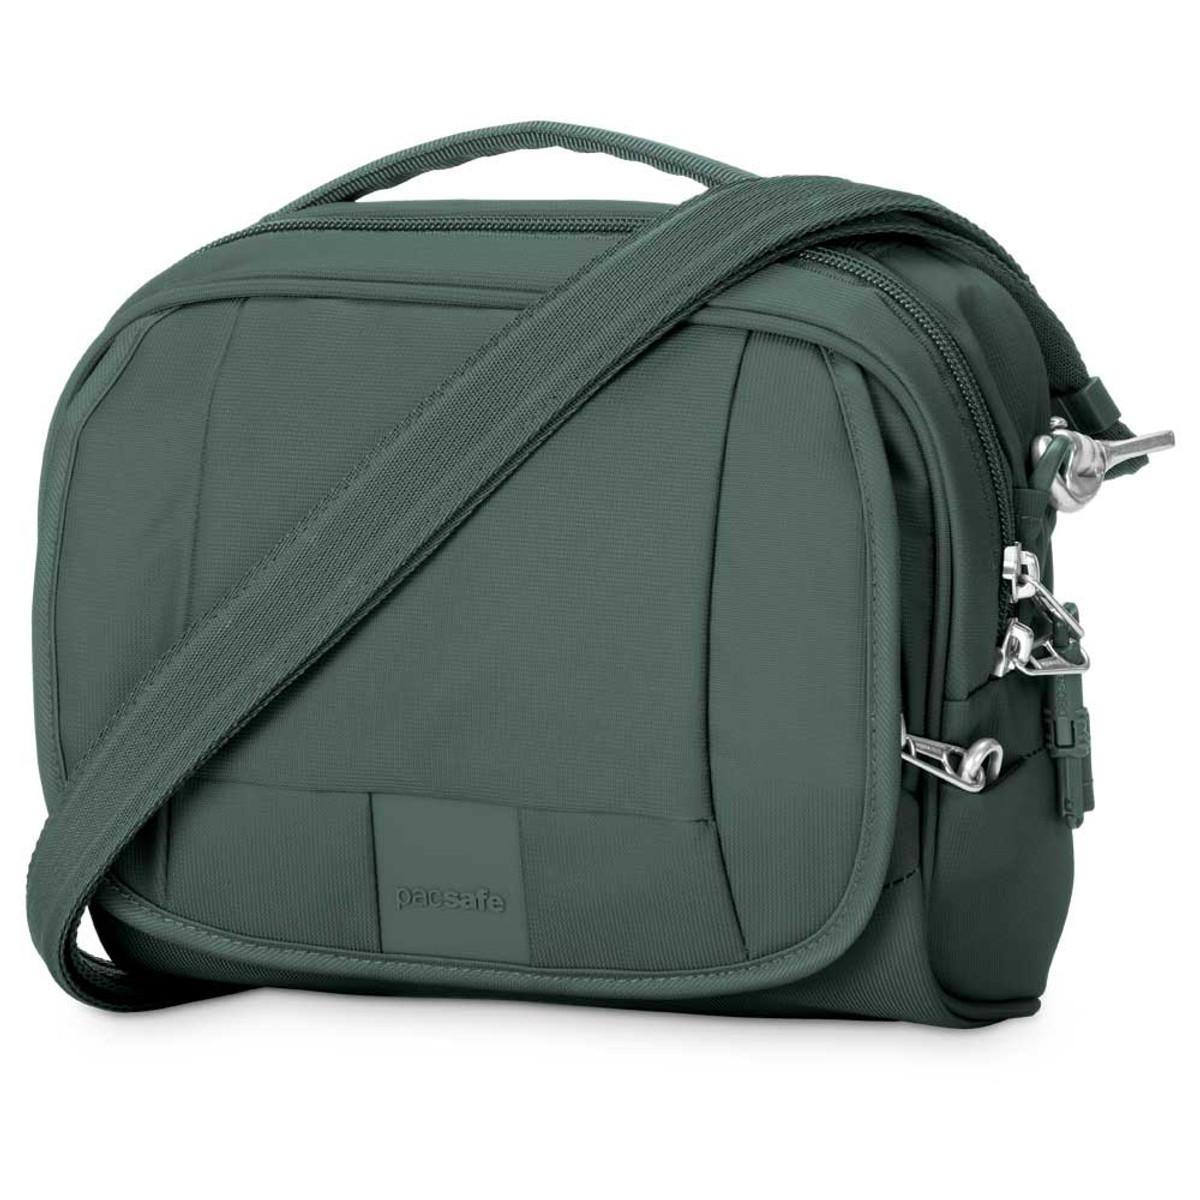 Pacsafe Metrosafe 140 compact shoulder bag, pine green